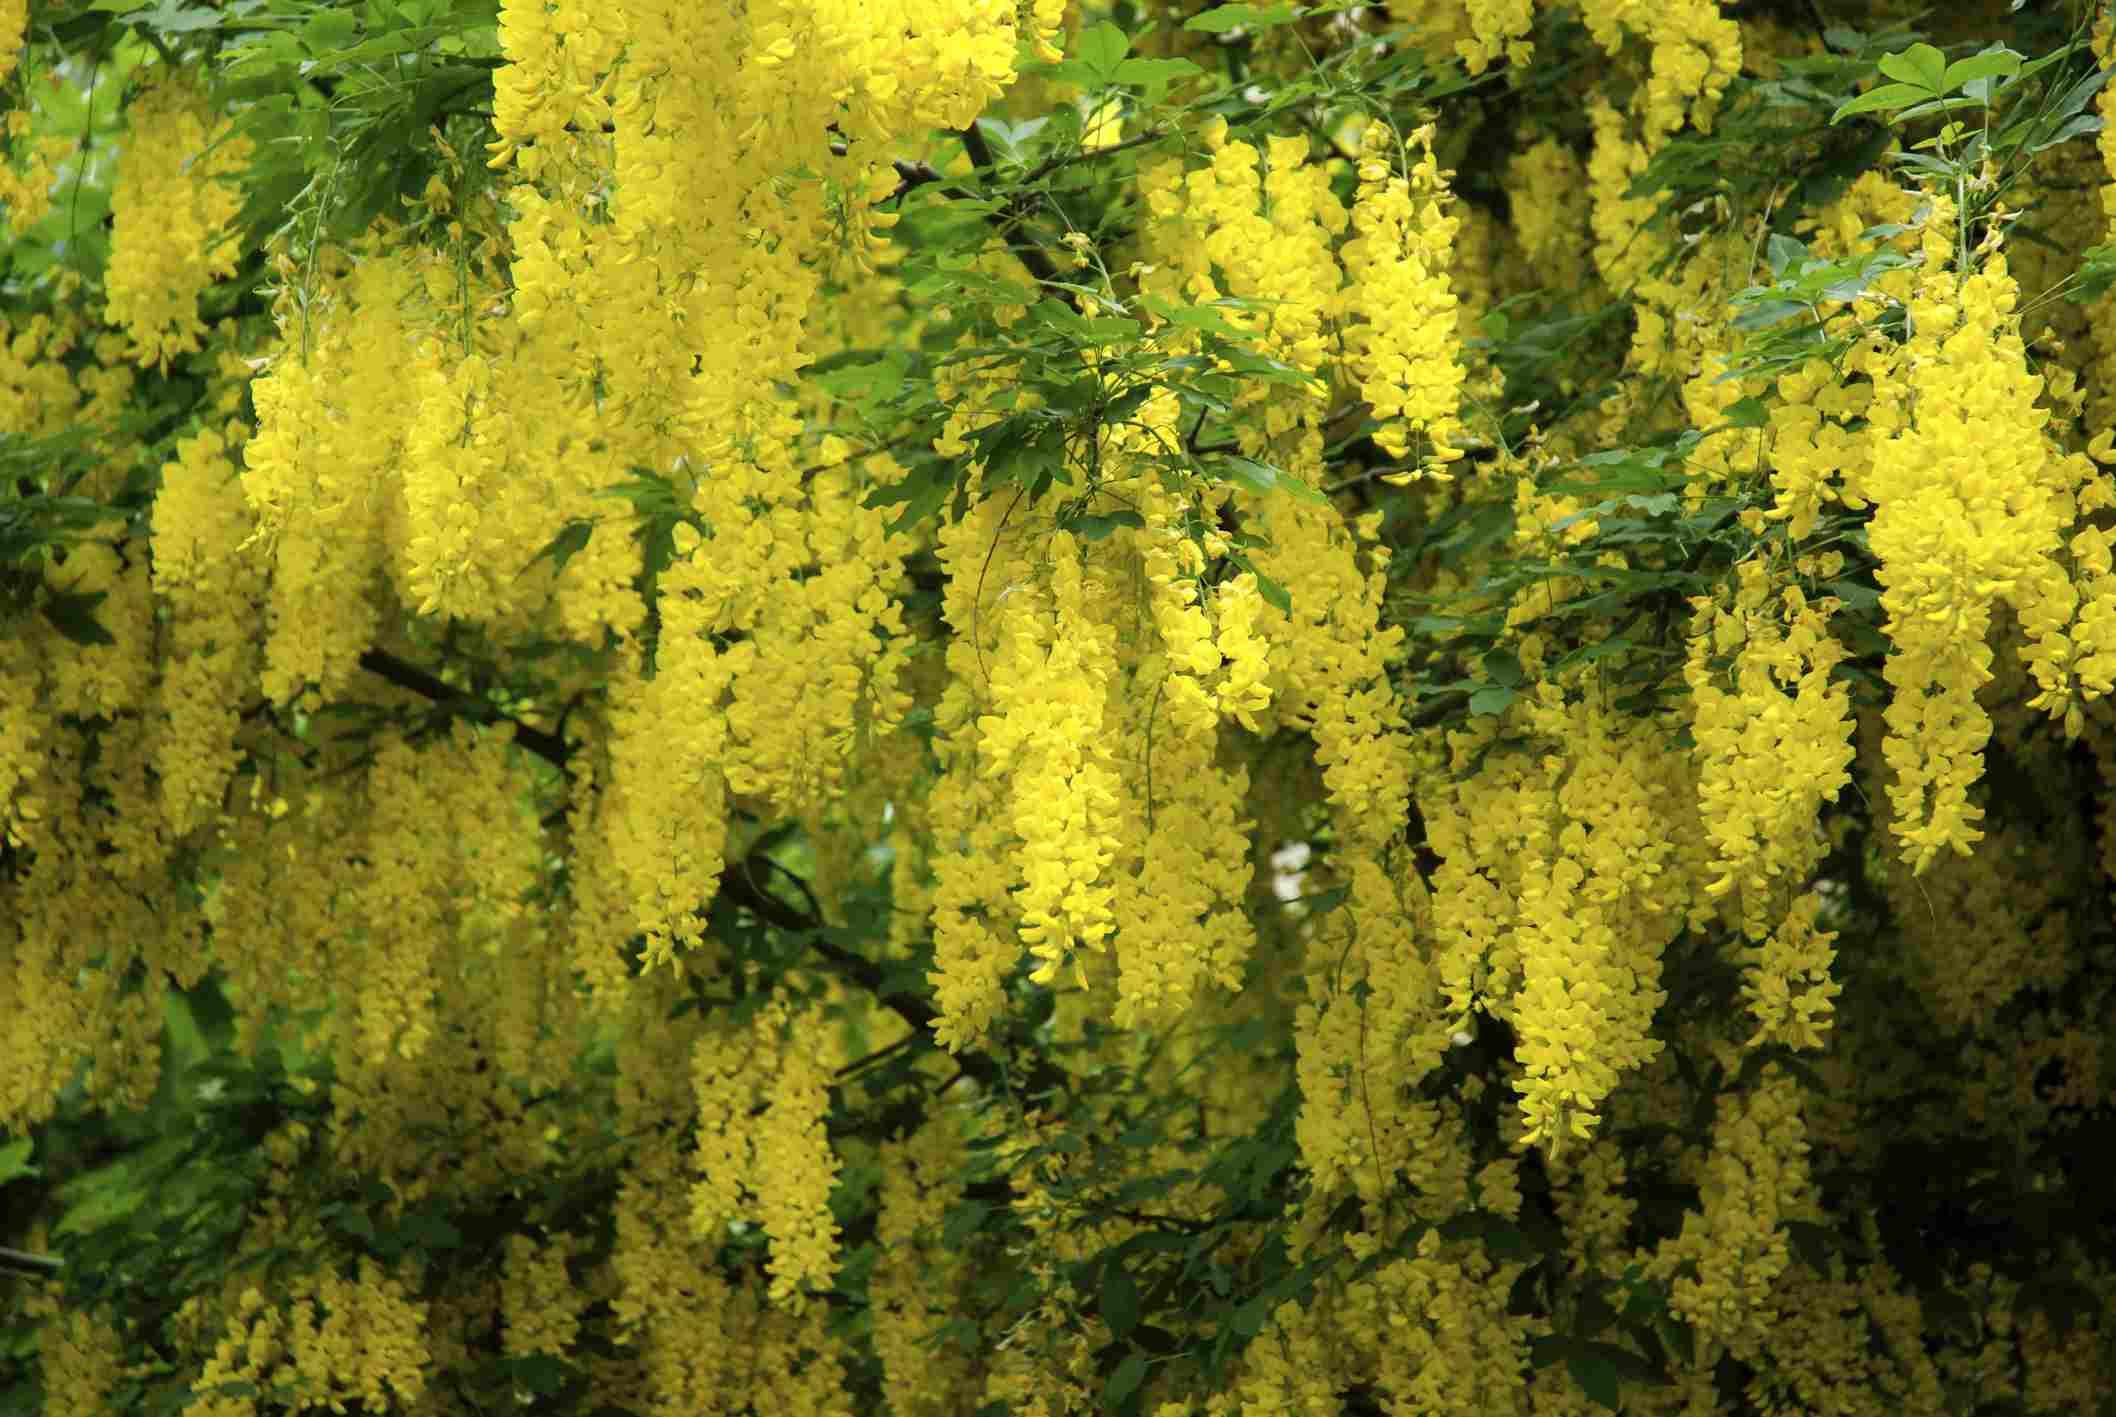 Golden chain flowers